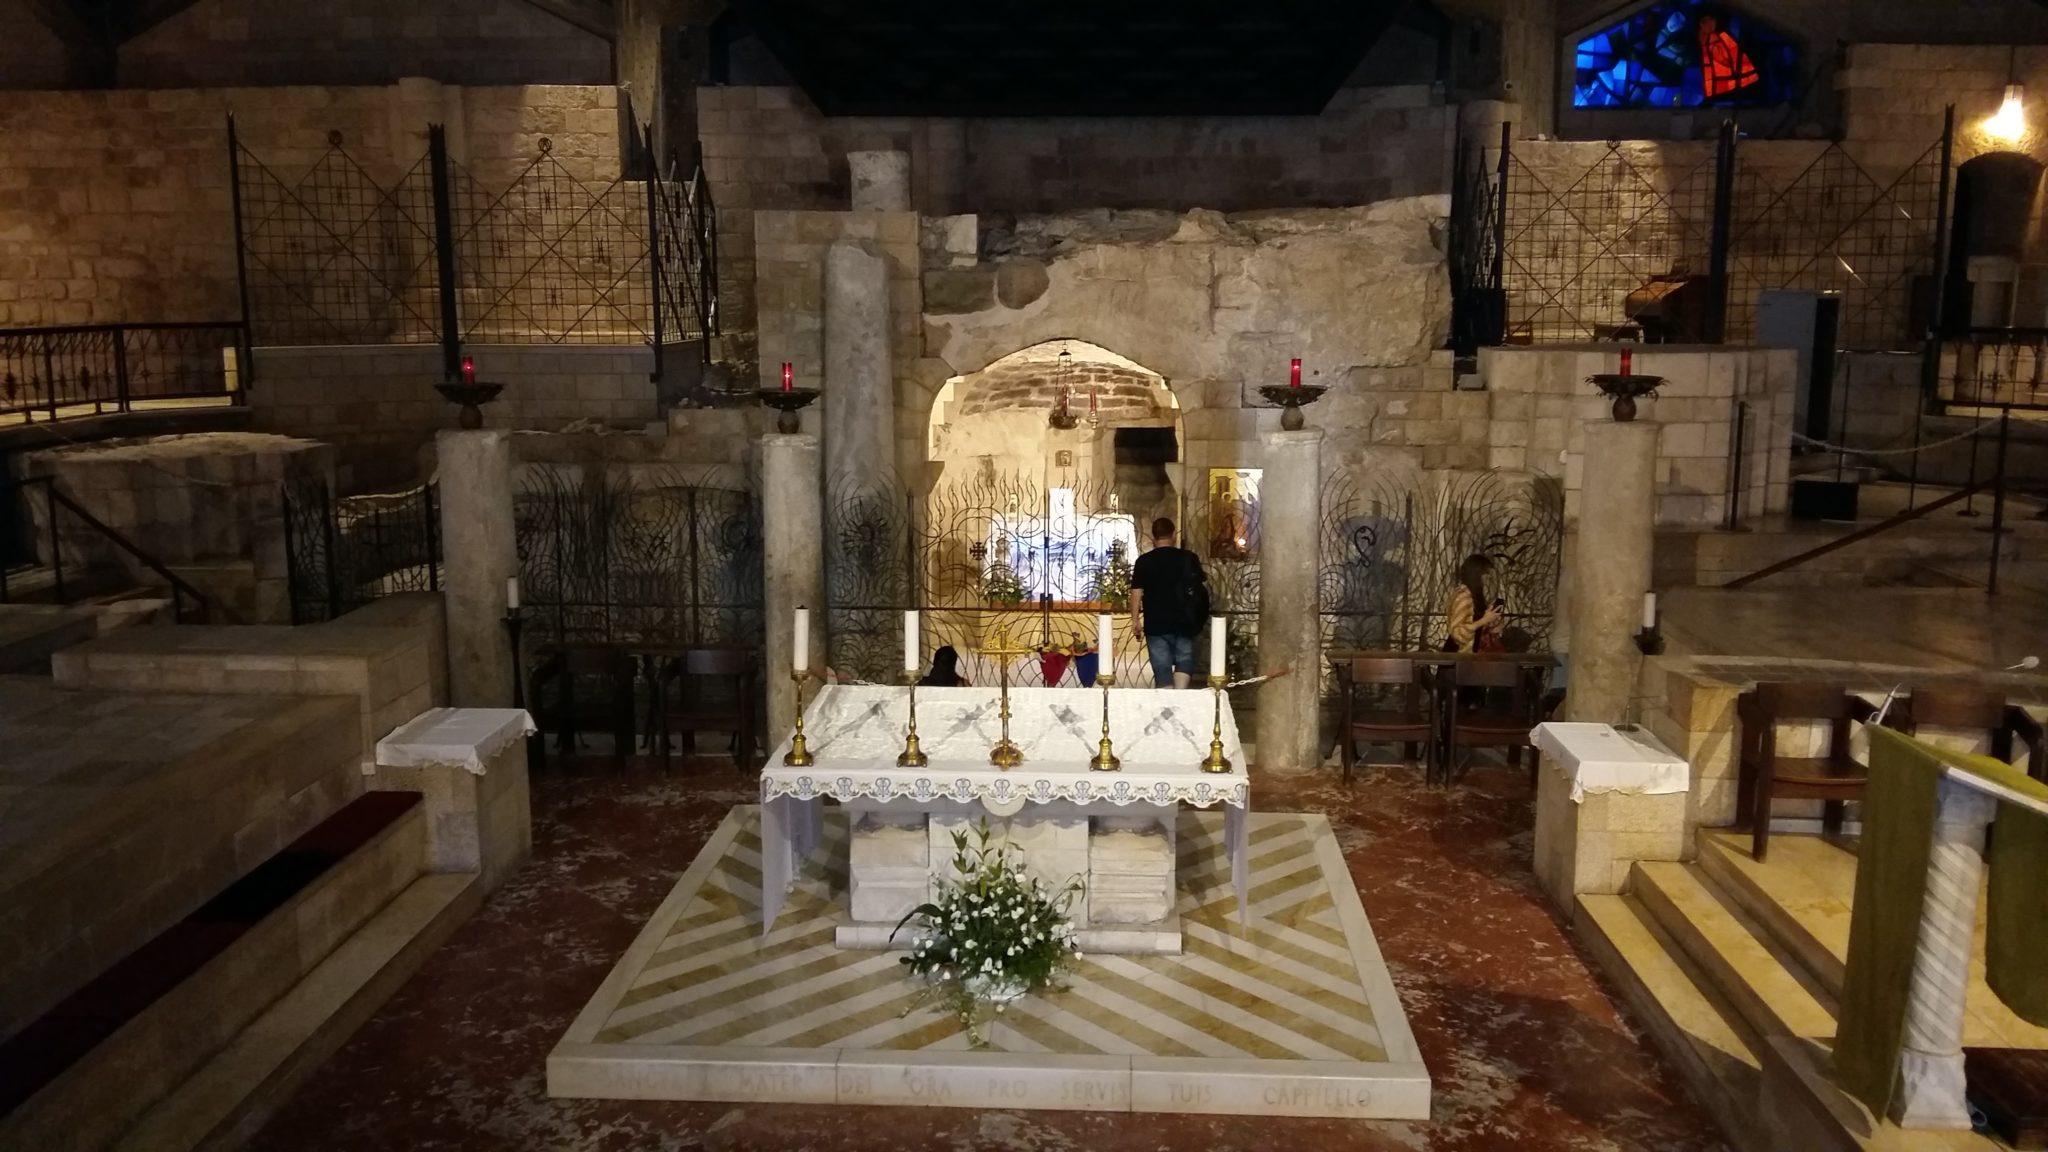 Seconda Puntata terra santa: a Nazareth